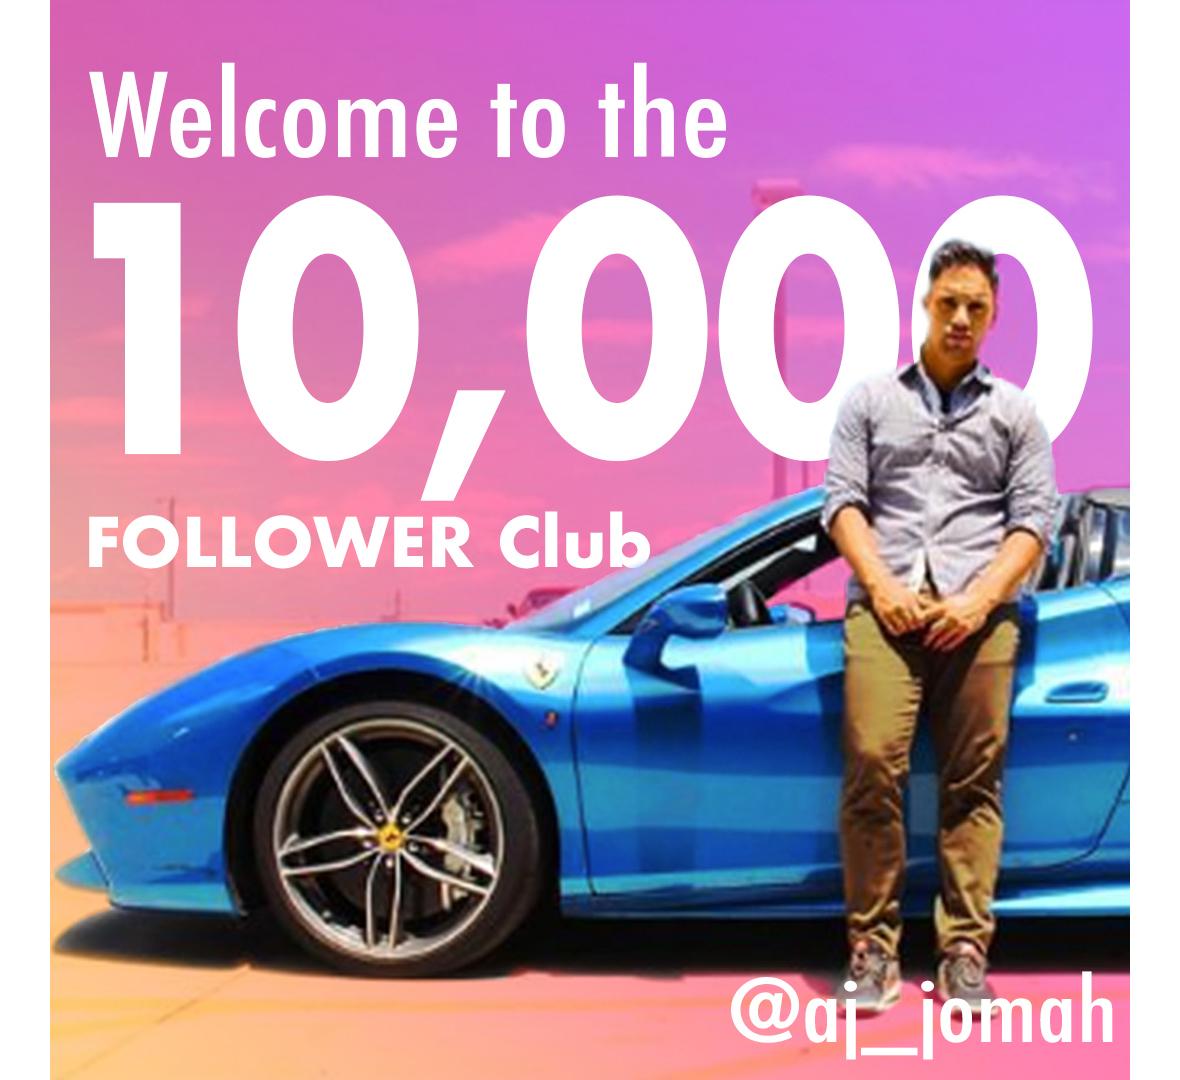 aj_jomah_10k club.jpg